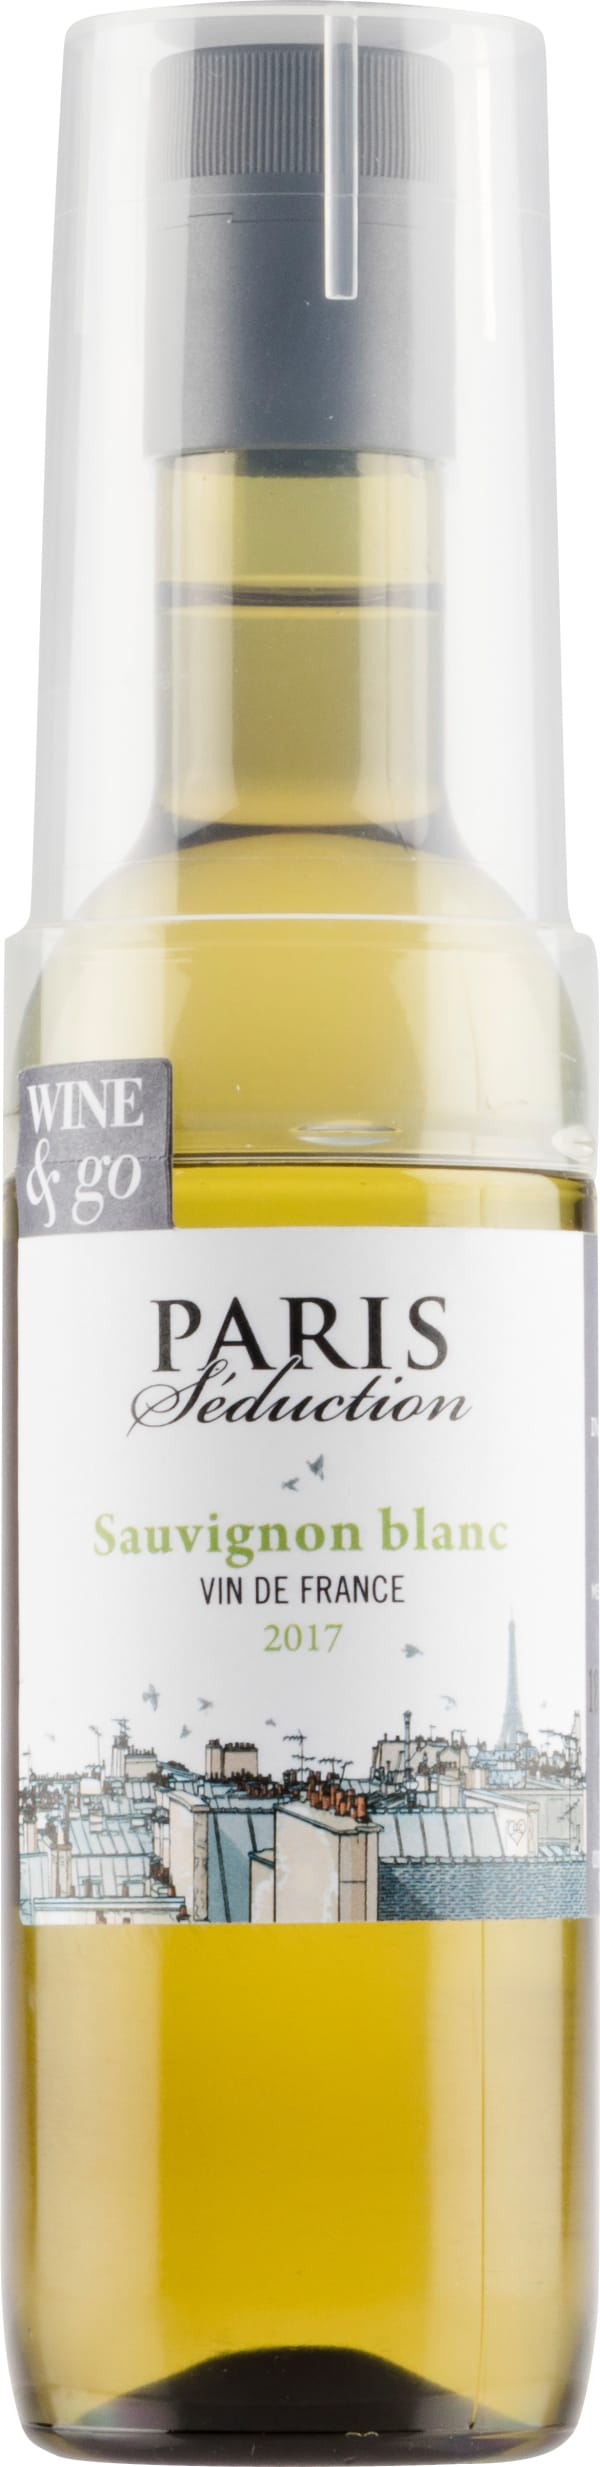 Paris Seduction Sauvignon Blanc 2017 plastflaska